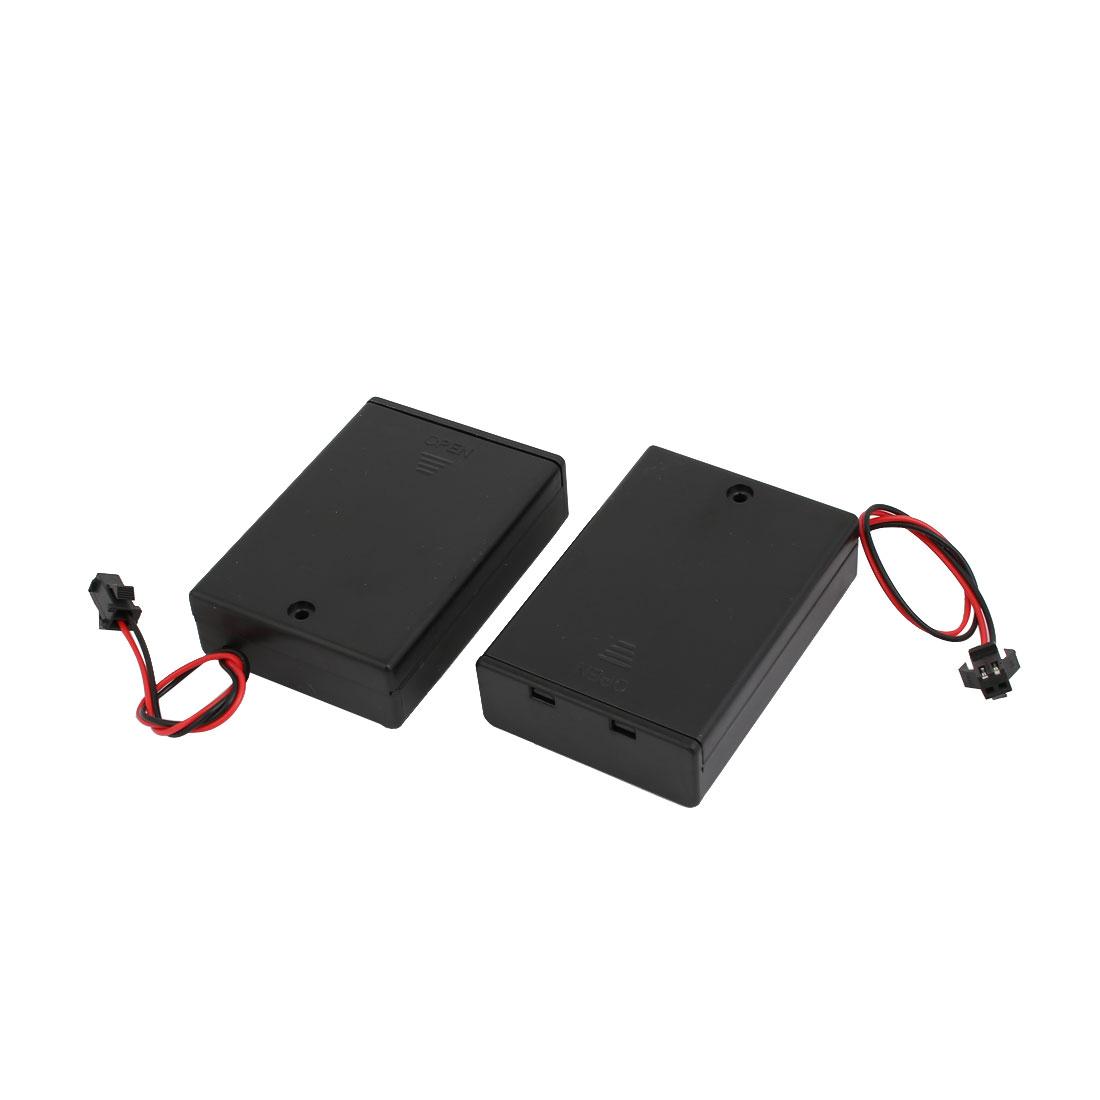 2Pcs Black Wired 3x1.5V AA Battery Storage Case Box On/Off Switch w Cap